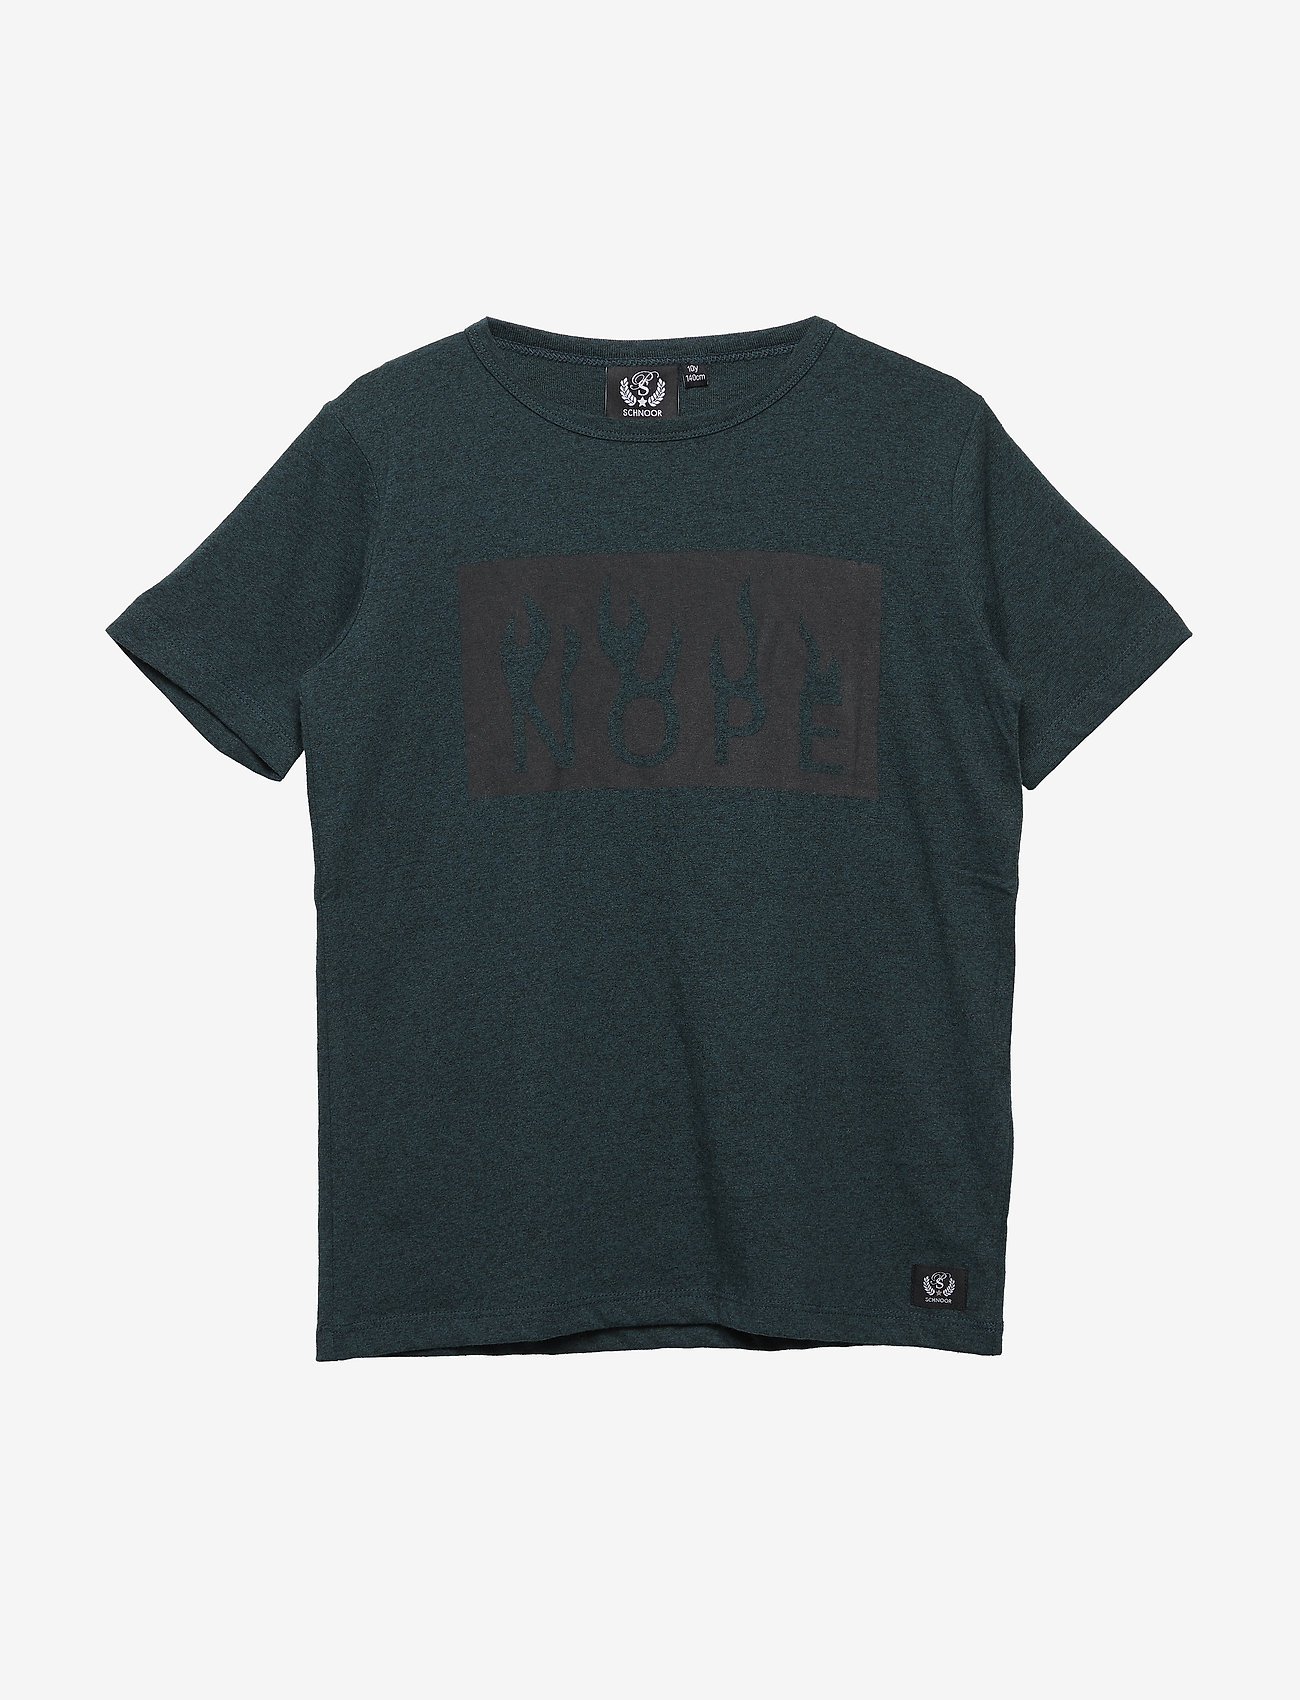 Petit by Sofie Schnoor - T-shirt short sleeve - kortærmede - dark green - 0